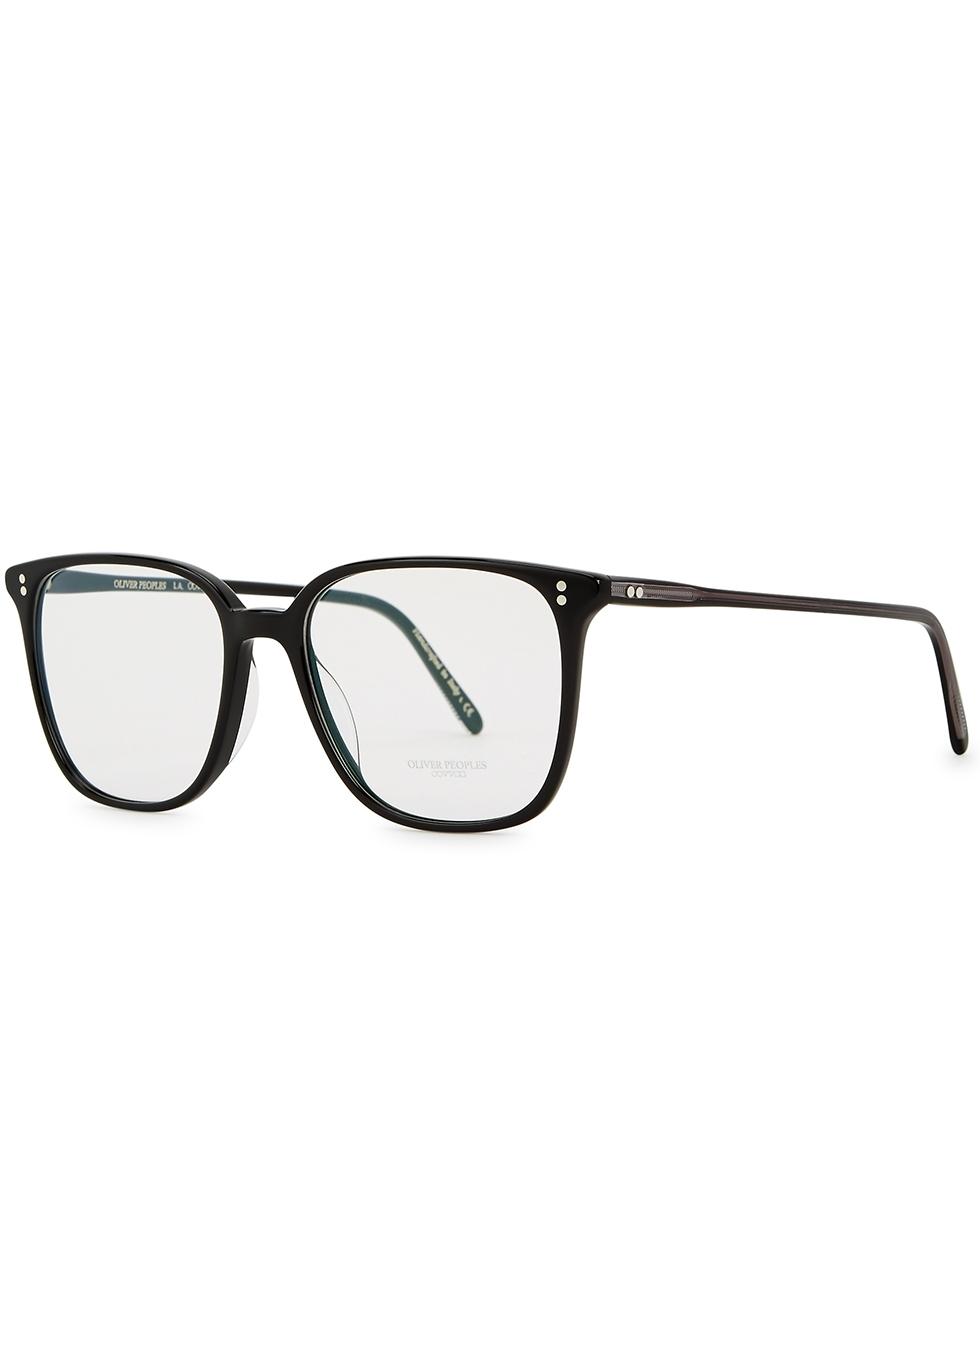 fa5d48743b Men s Designer Optical Glasses - Harvey Nichols